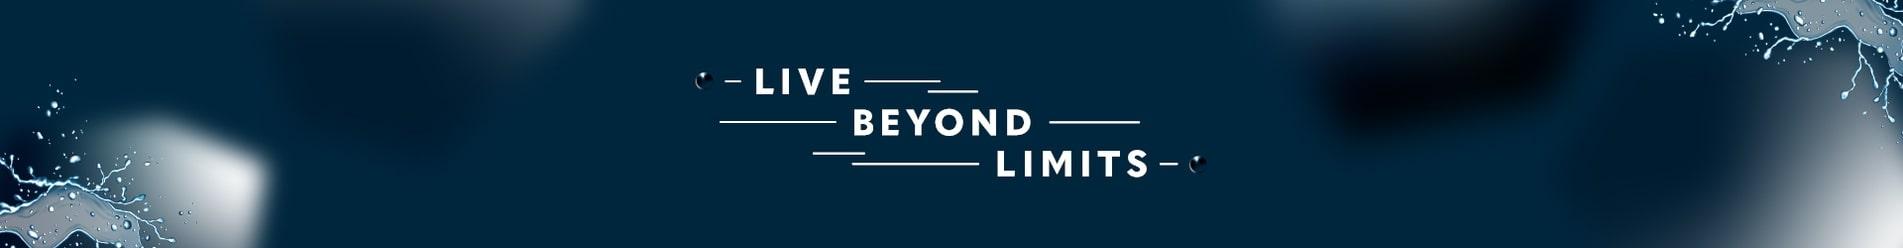 live-beyond-limits-background